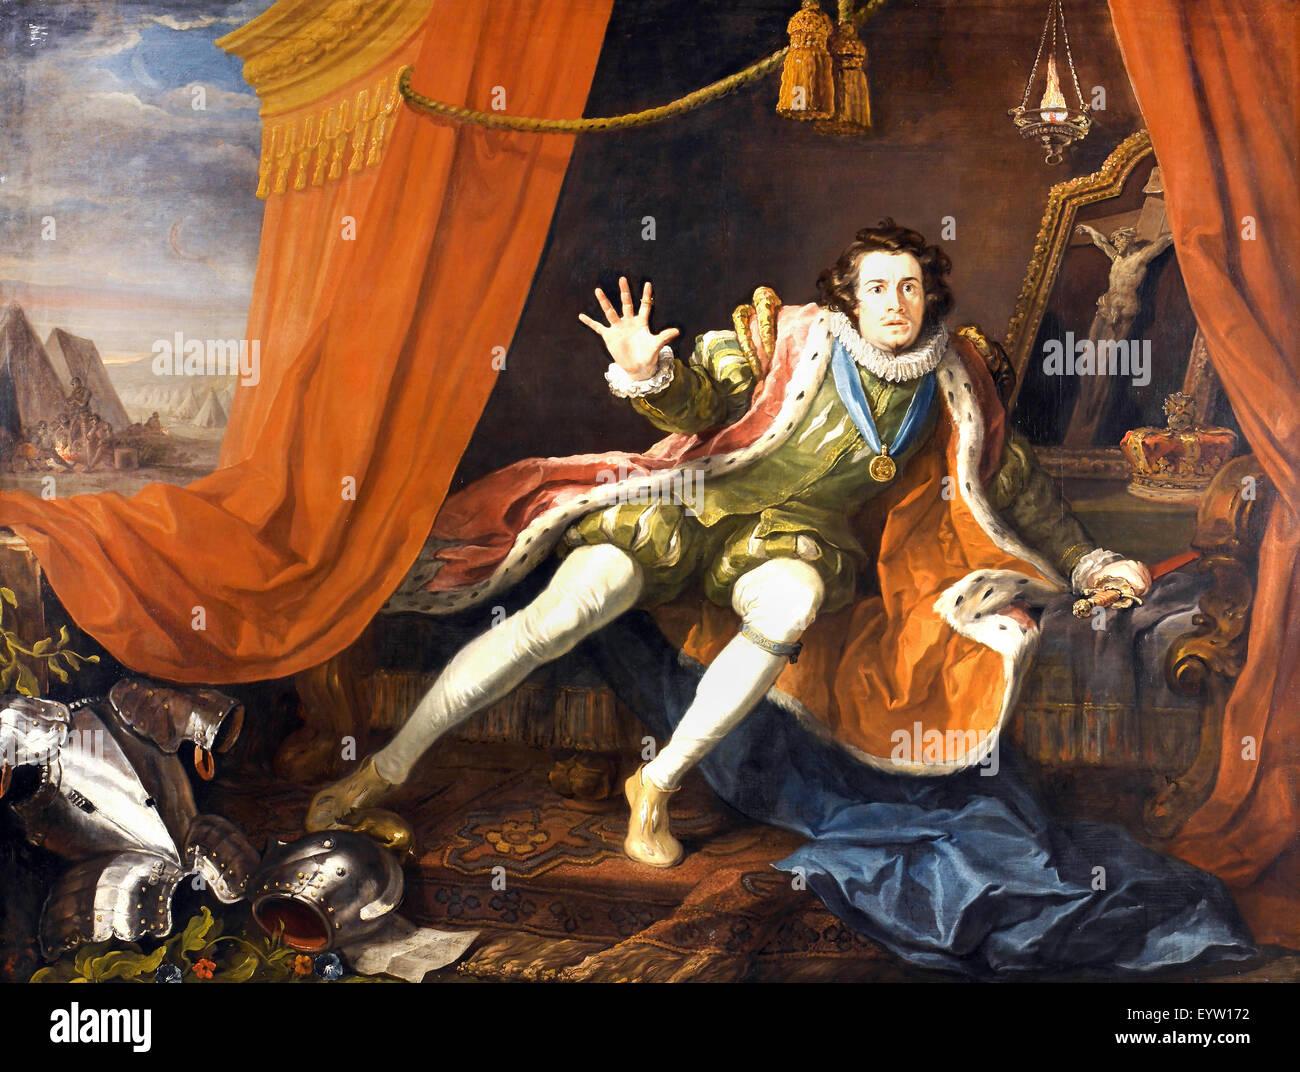 William Hogarth, David Garrick as Richard III. Circa 1745. Oil on canvas. Walker Art Gallery, Liverpool, England. - Stock Image